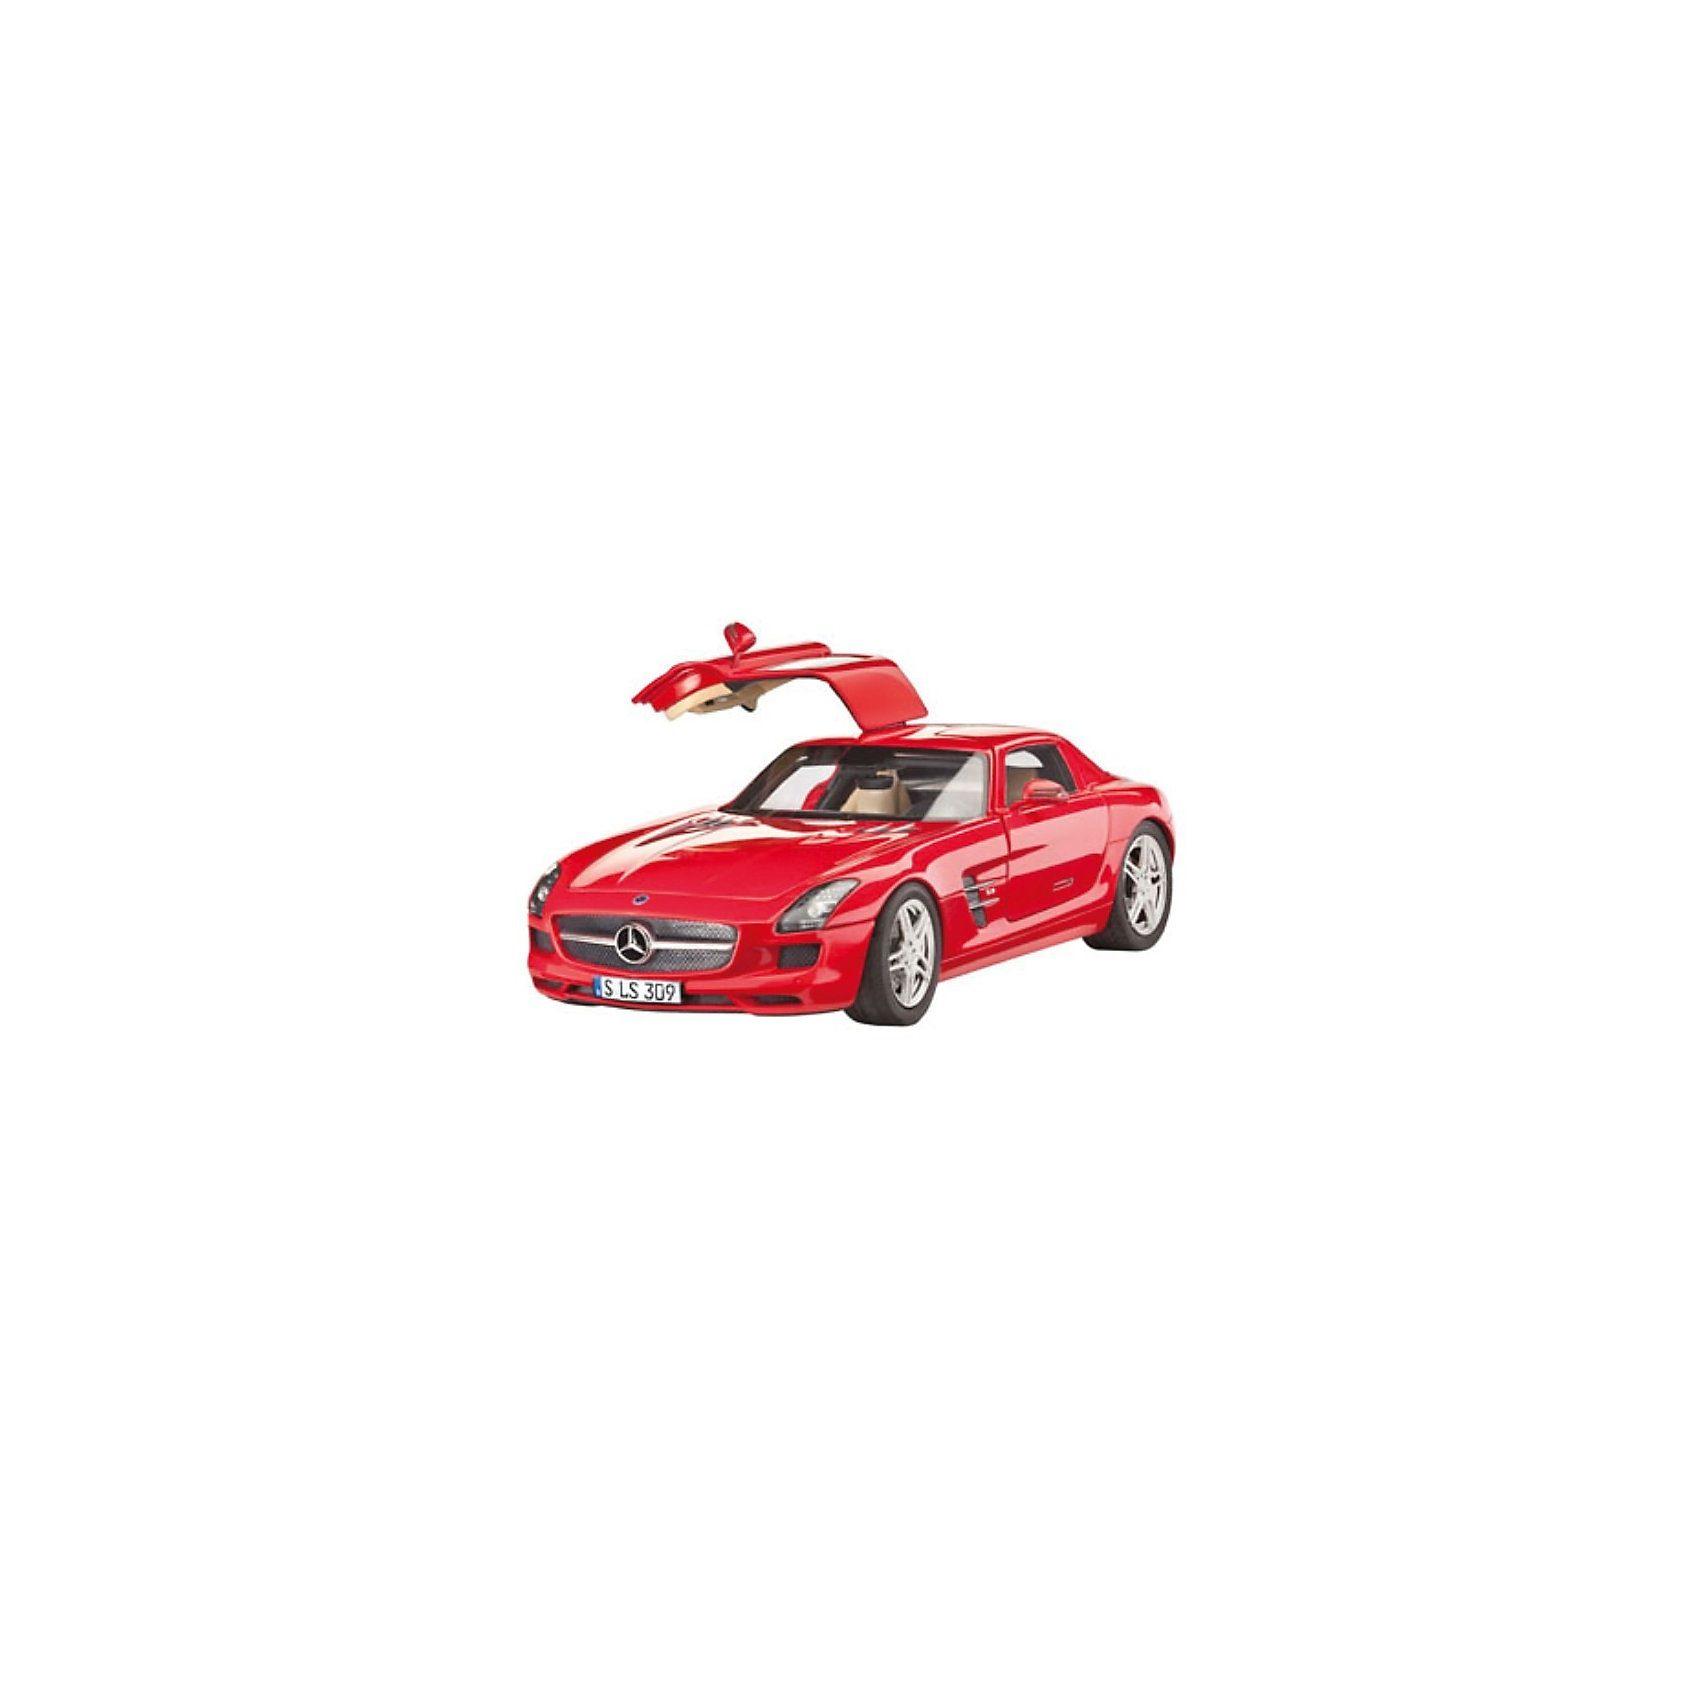 Revell Modellbausatz Mercedes SLS AMG